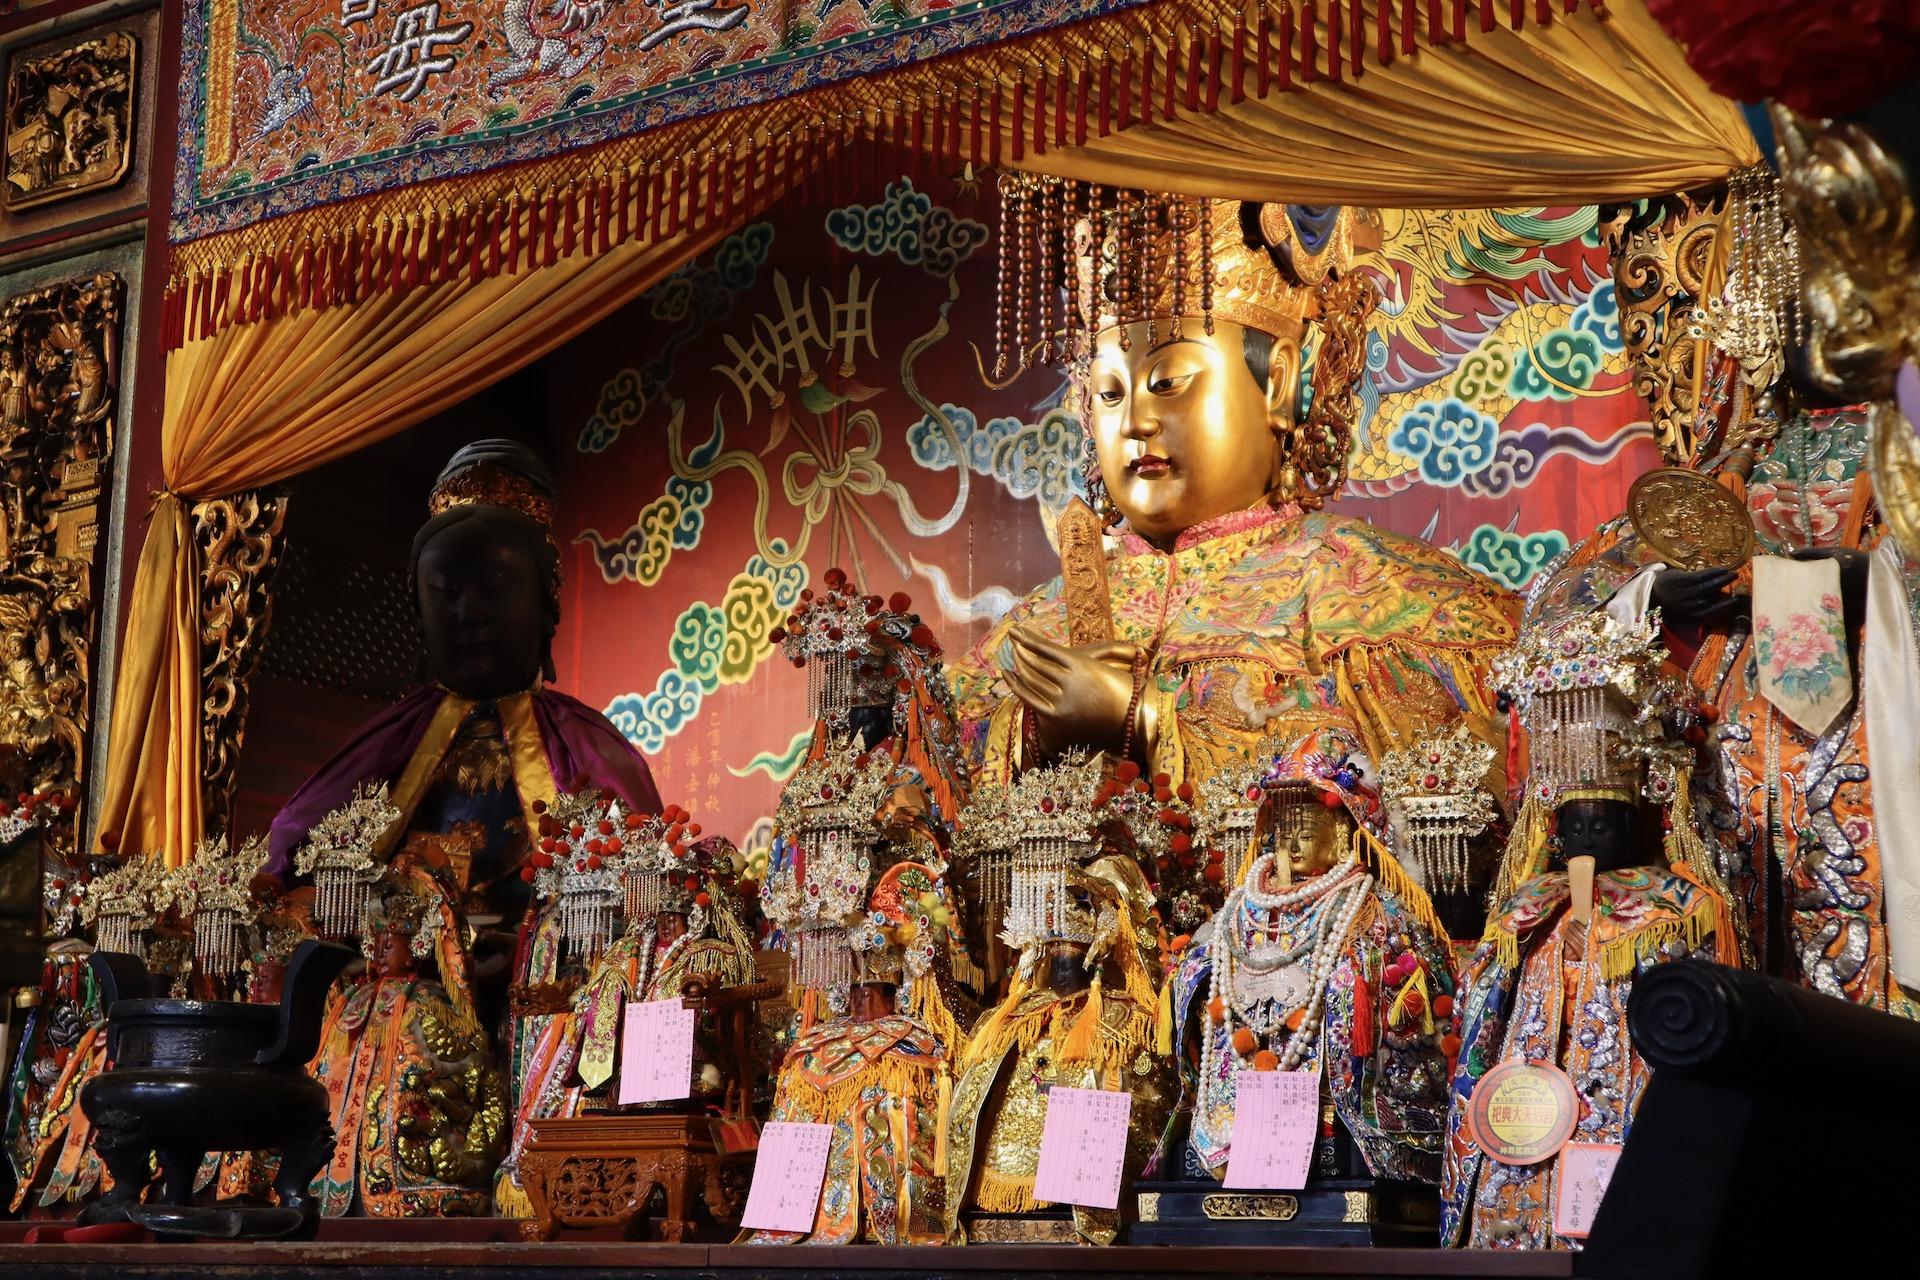 Tainan Grand Matsu Temple